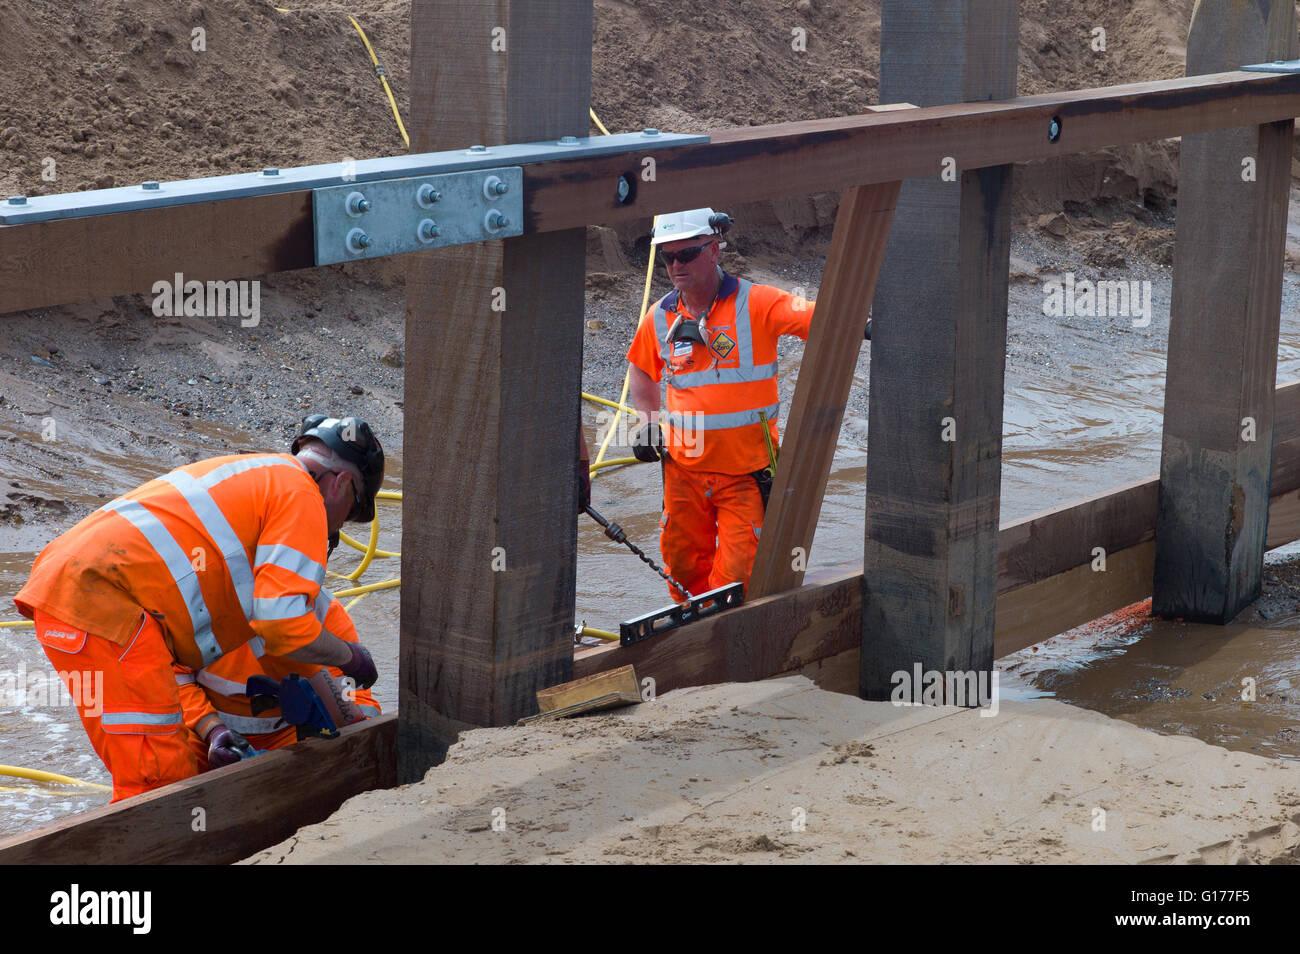 Workmen rebuilding the groins on Dawlish beach in South Devon UK. This area has had big coastal erosion problems - Stock Image